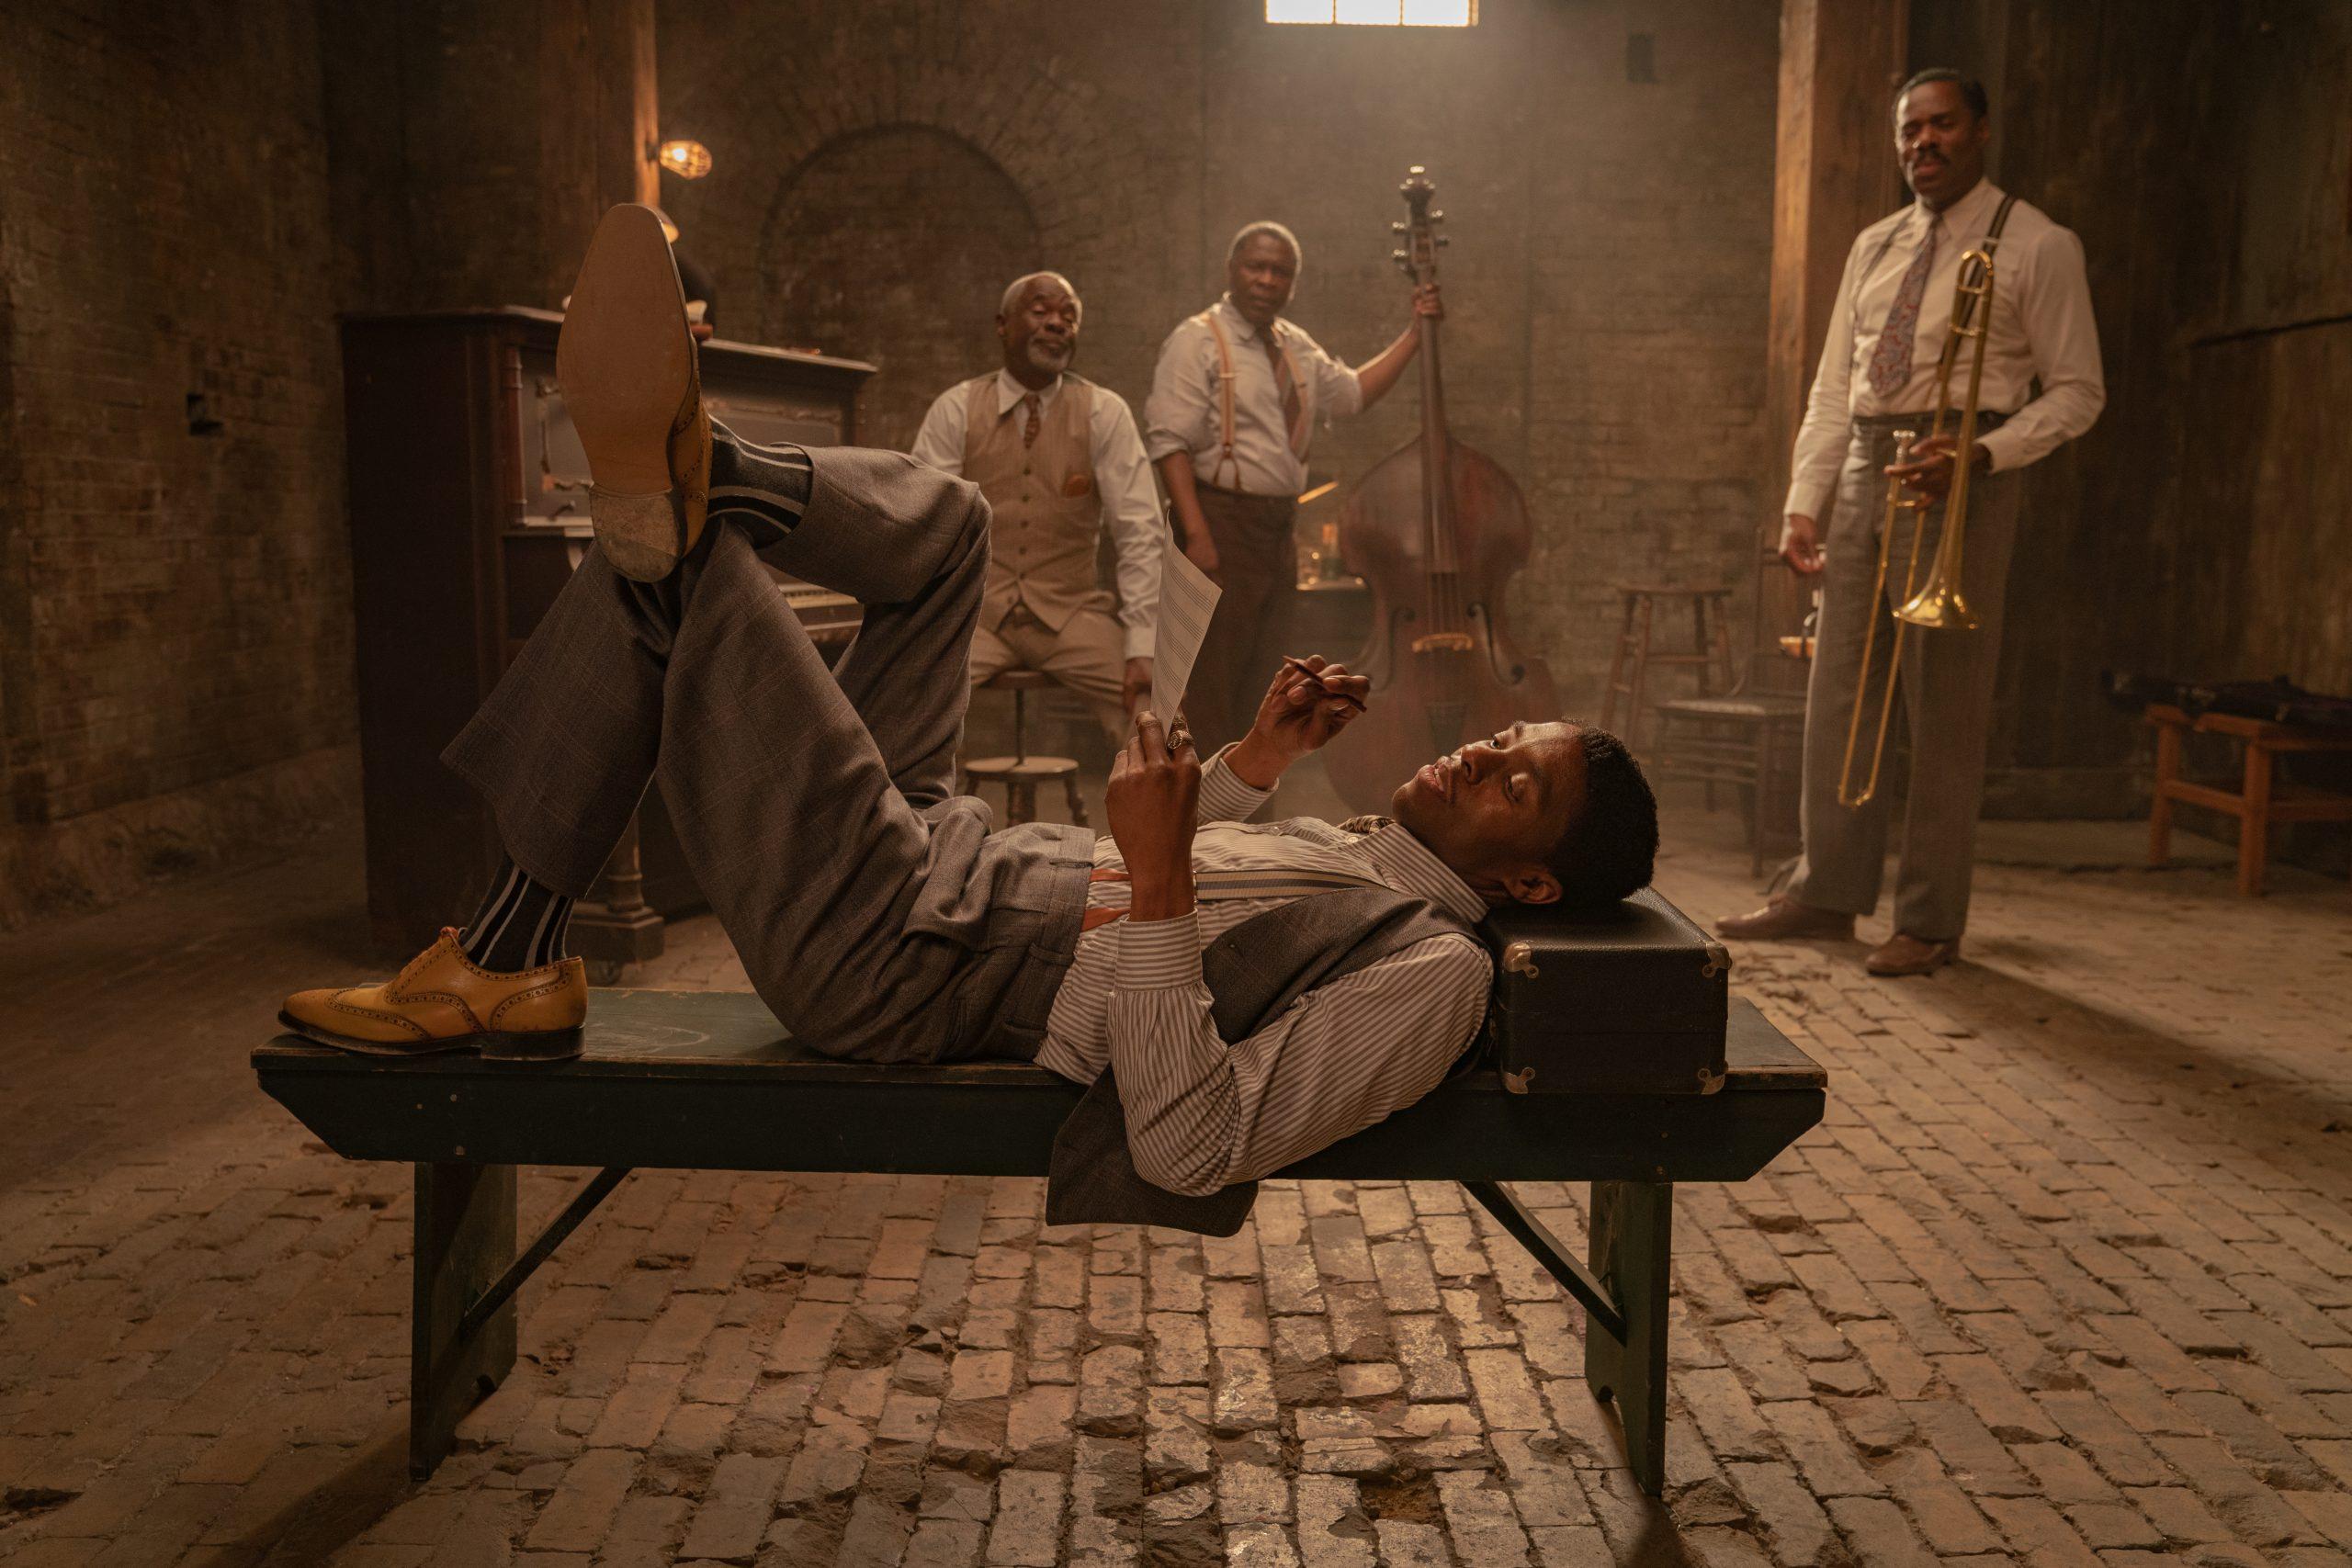 From left to right: Chadwick Boseman, Glynn Turman, Michael Potts, Colman Domingo in 'Ma Rainey's Black Bottom' on Netflix. (David Lee / Netflix)